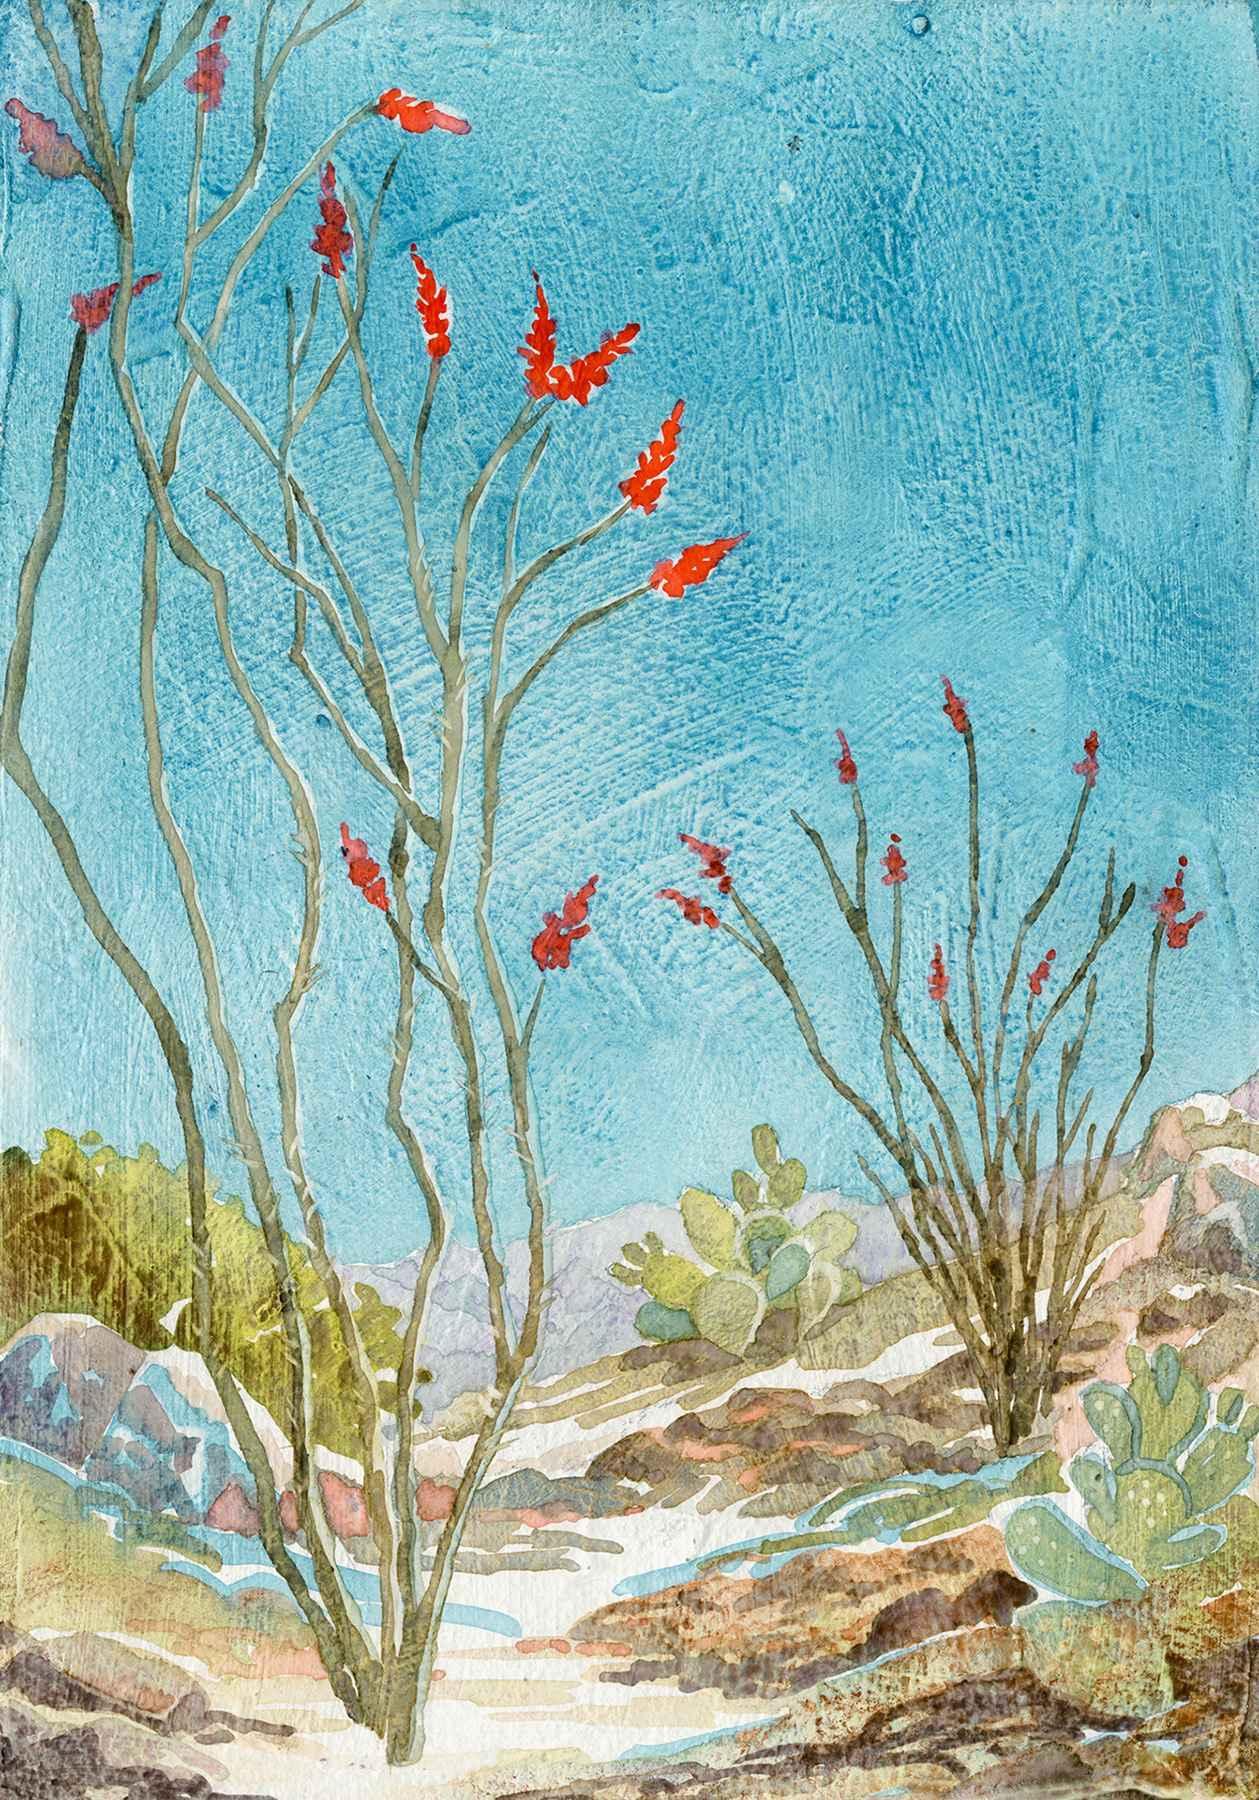 OCOTILLO by  Ellen Fountain - Masterpiece Online